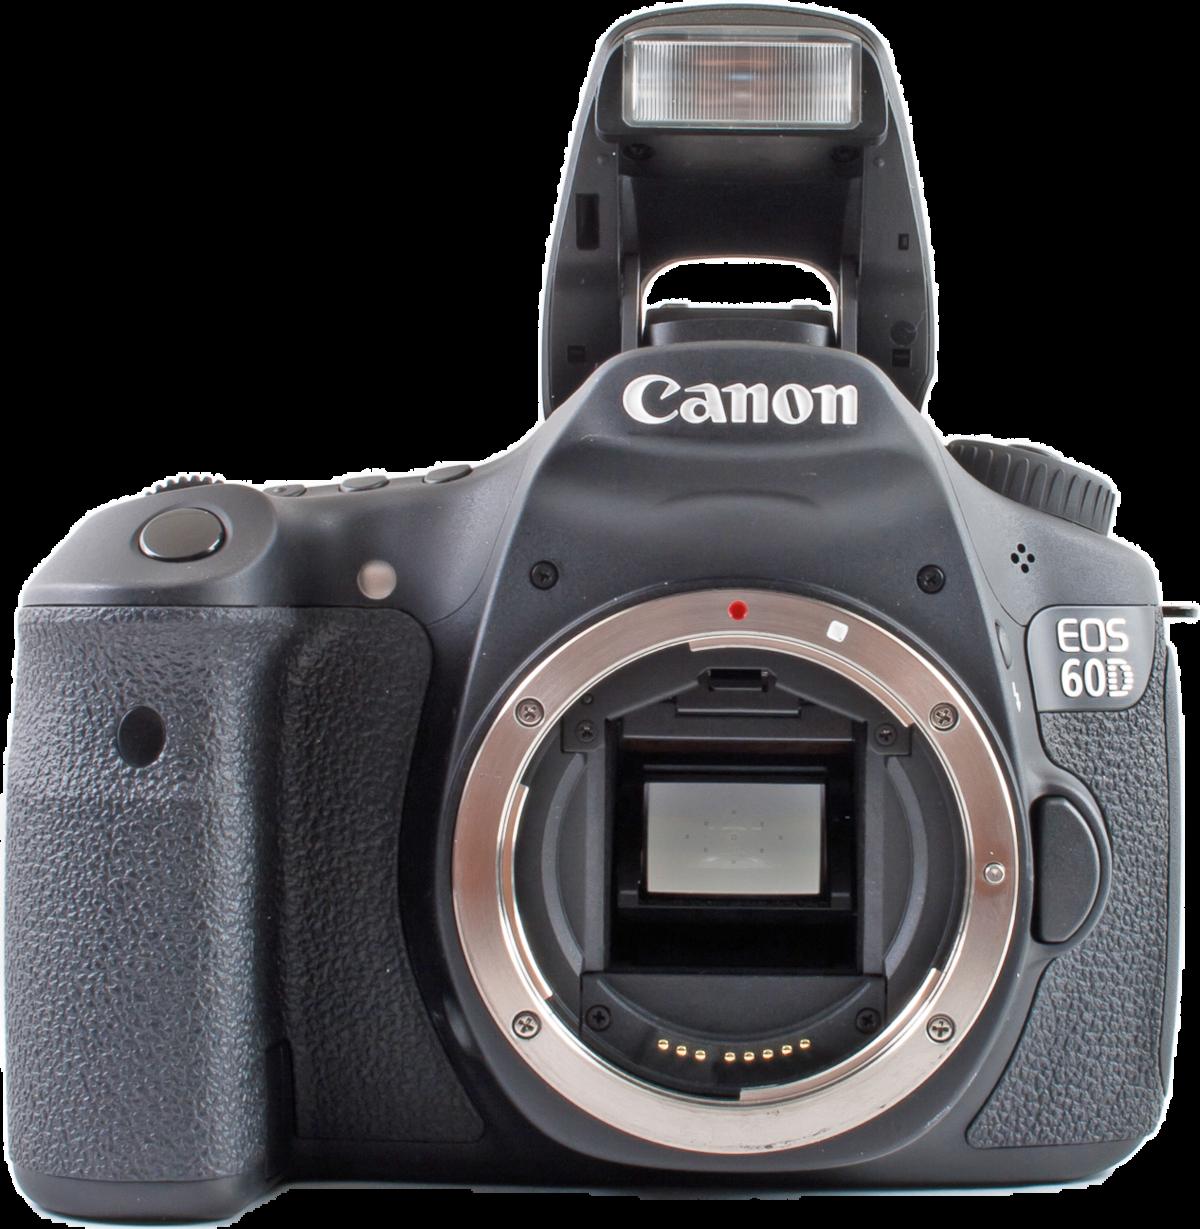 Canon EOS 60D - Wikipedia, la enciclopedia libre